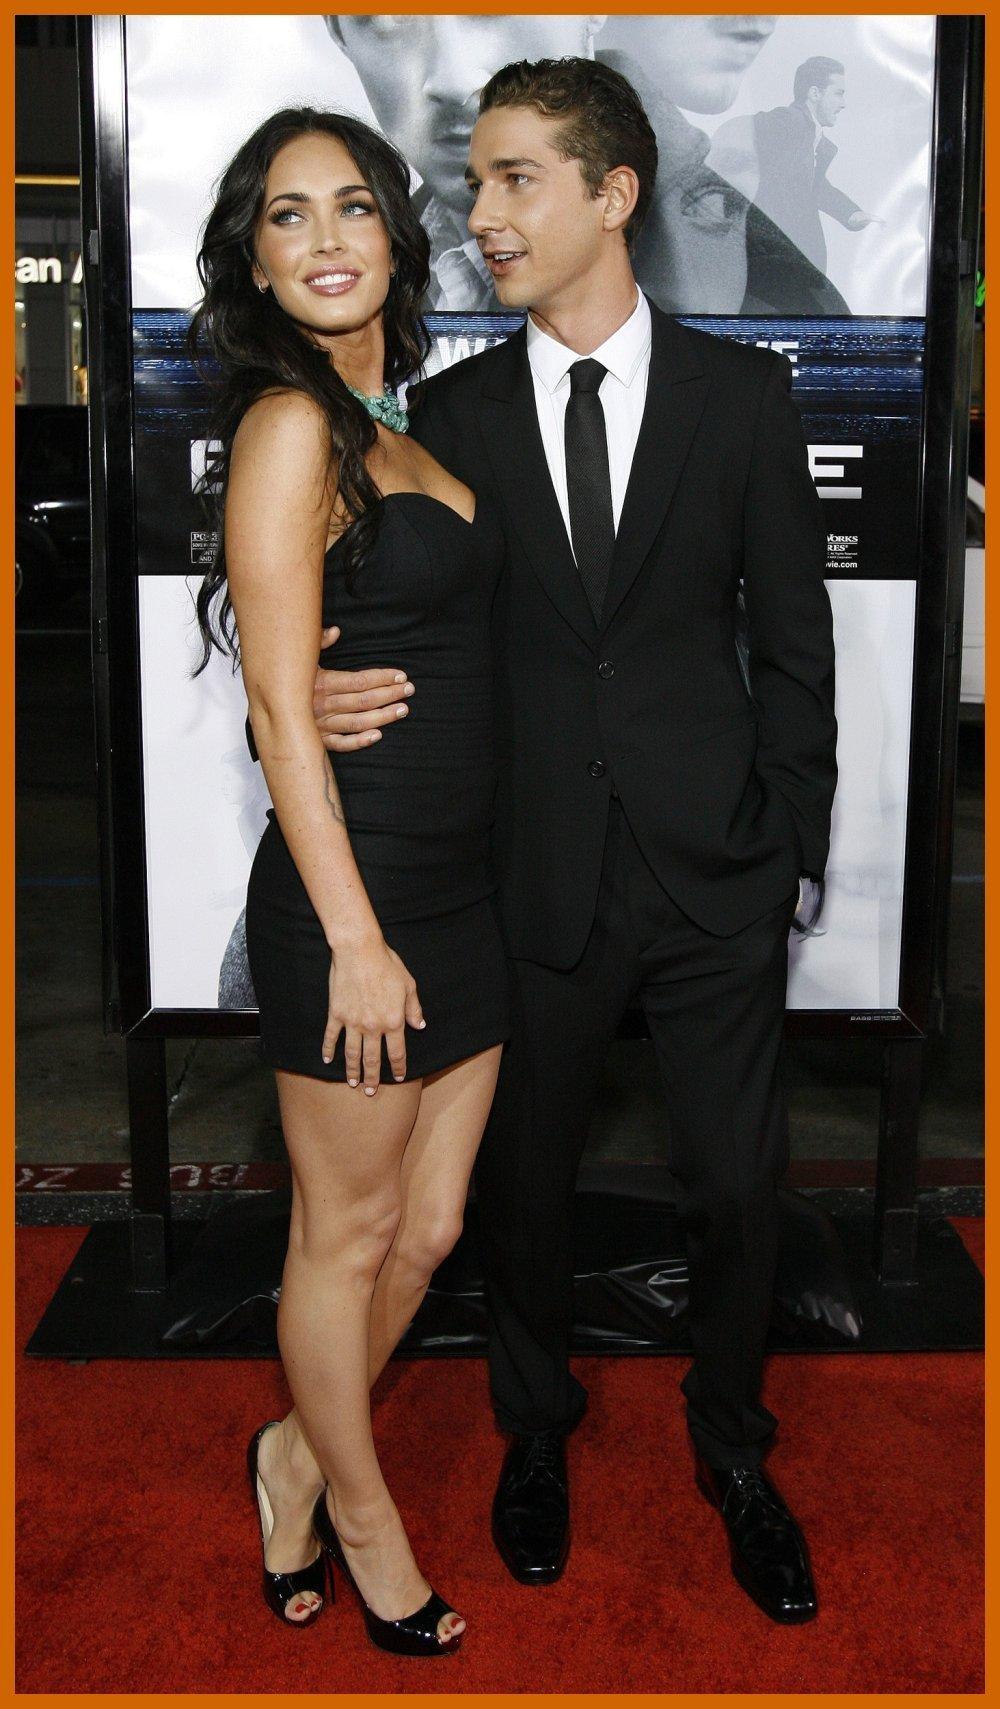 Megan Fox And Shia LaBeouf At The Premiere Of The Movie Eagle Eye - shia-labeouf photo